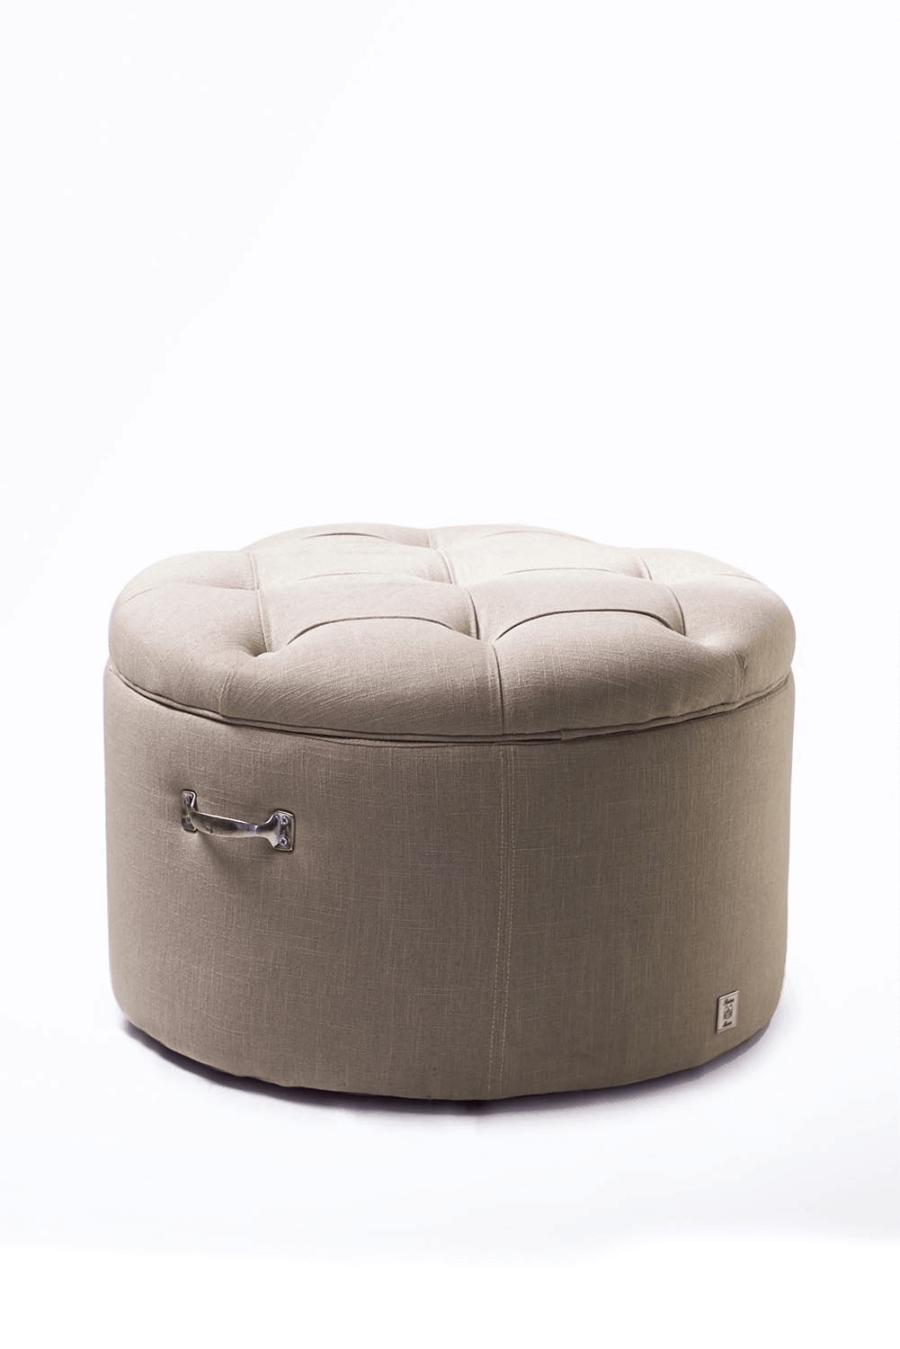 Park Avenue Footstool linen Flax